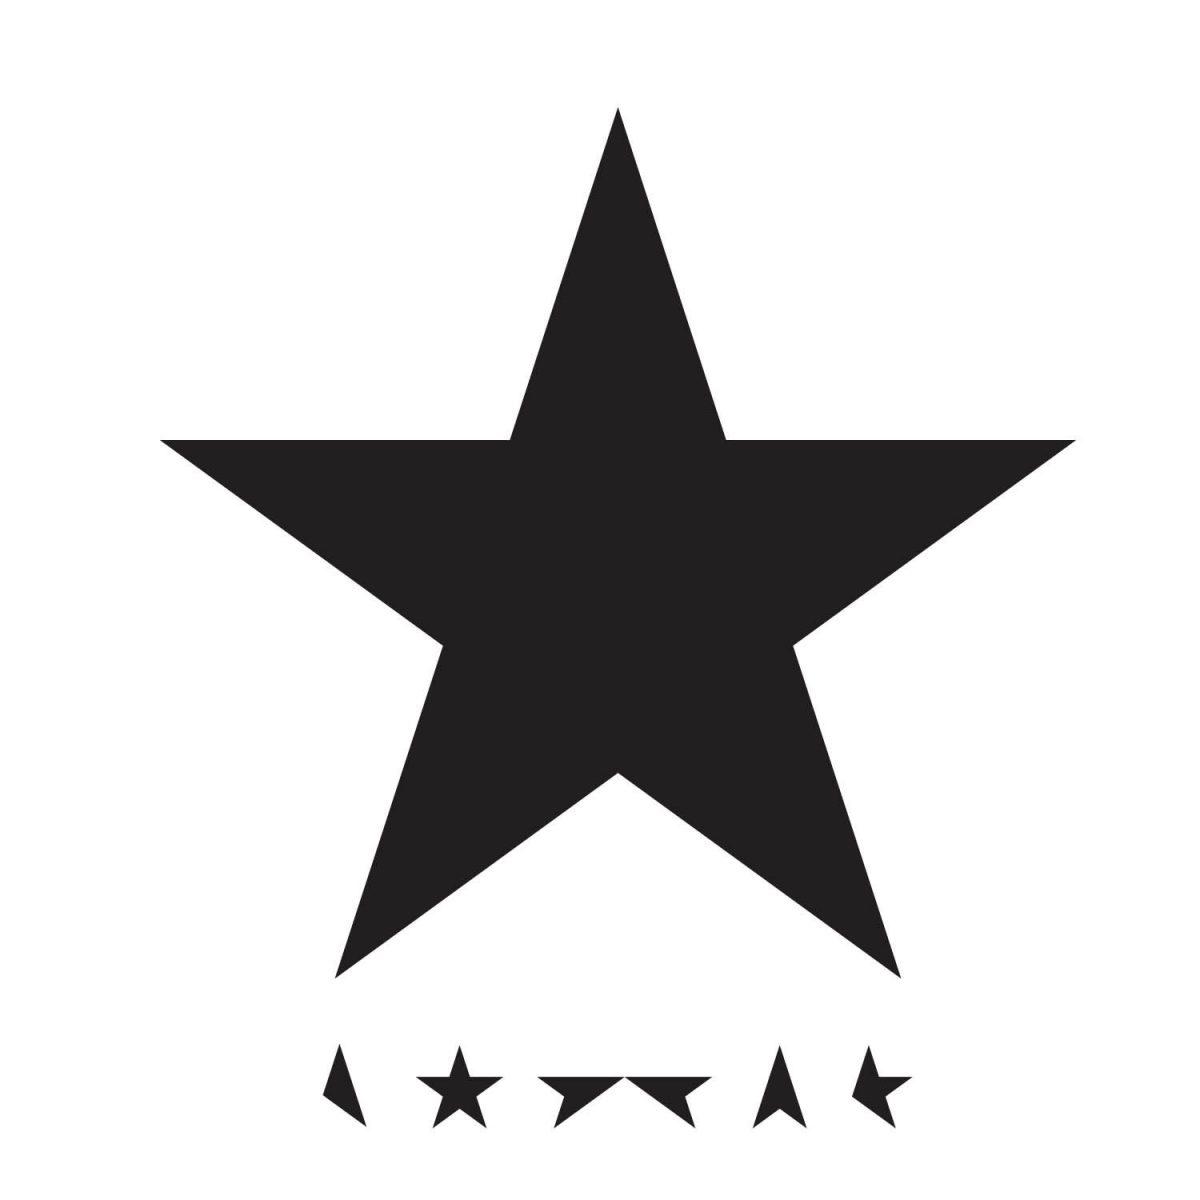 Bowie, David: Black Star (2016)